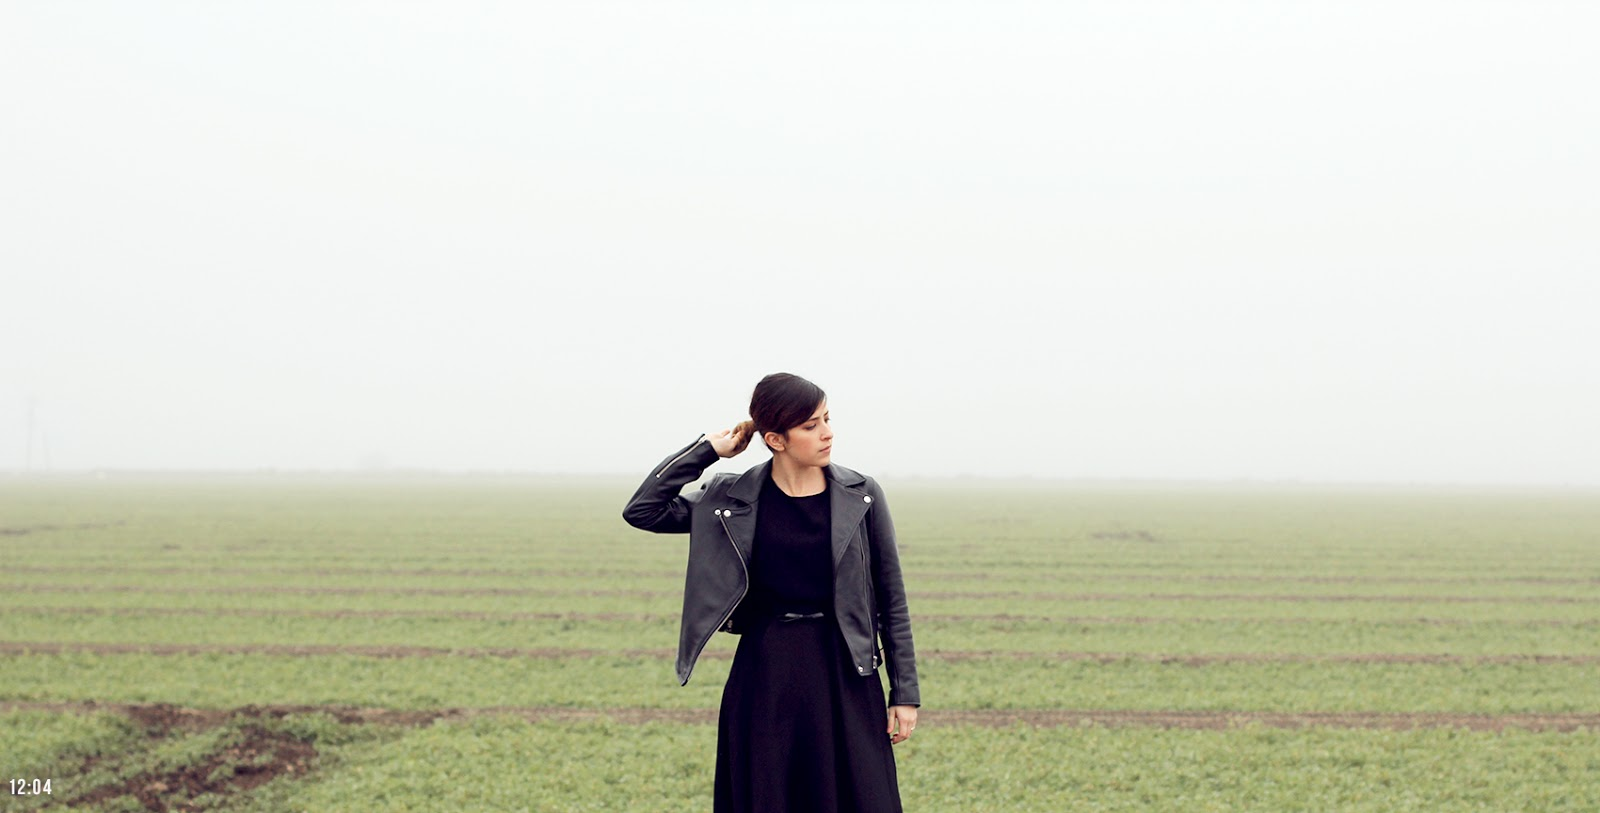 437-twelvoefour-dixon-fog-all-black-yang-li-everlane-IMG_5765.jpg